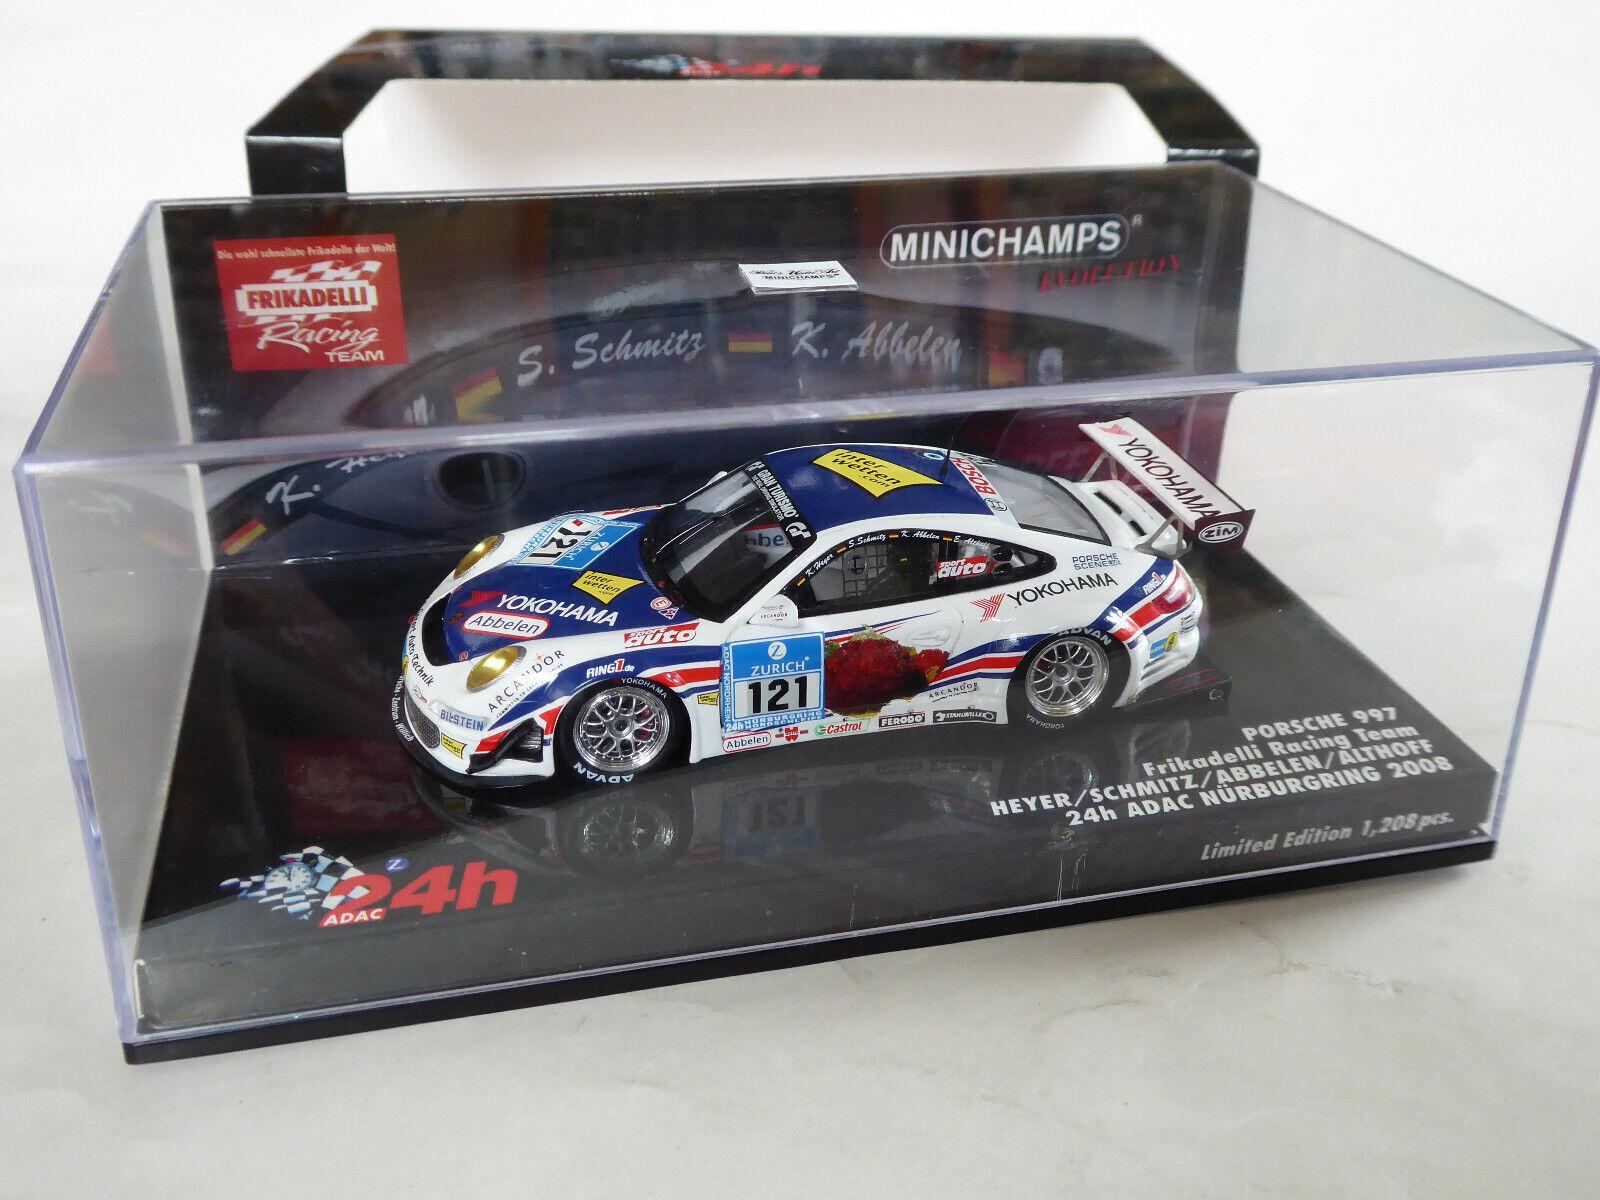 Minichamps 1 43 Porsche 911 997 GT3 Frikadelli Nürburgring Abbelen OVP 437086121